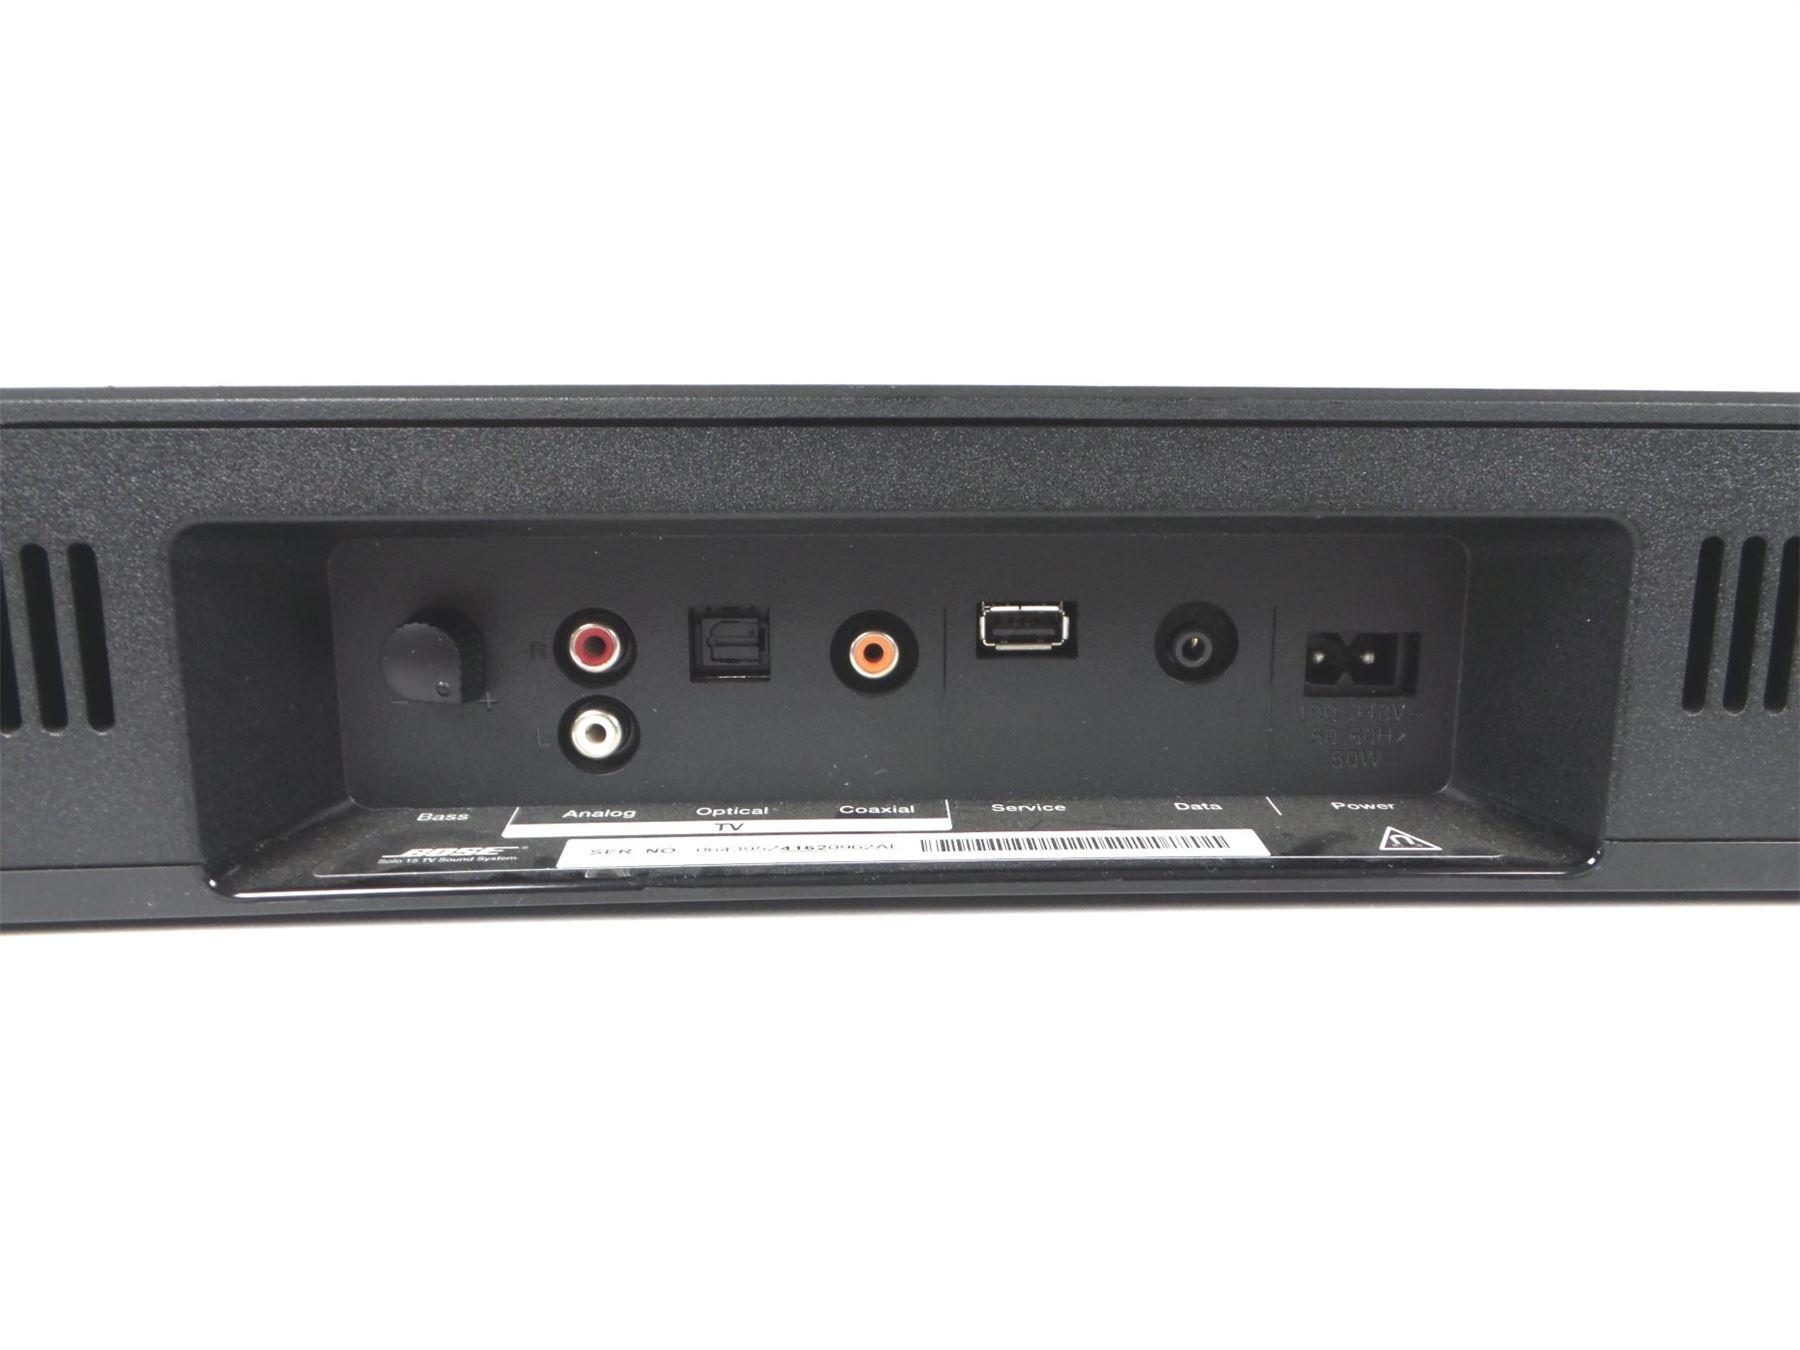 Bose Solo 15 Series I Sound System Soundbar Home Theater Speaker